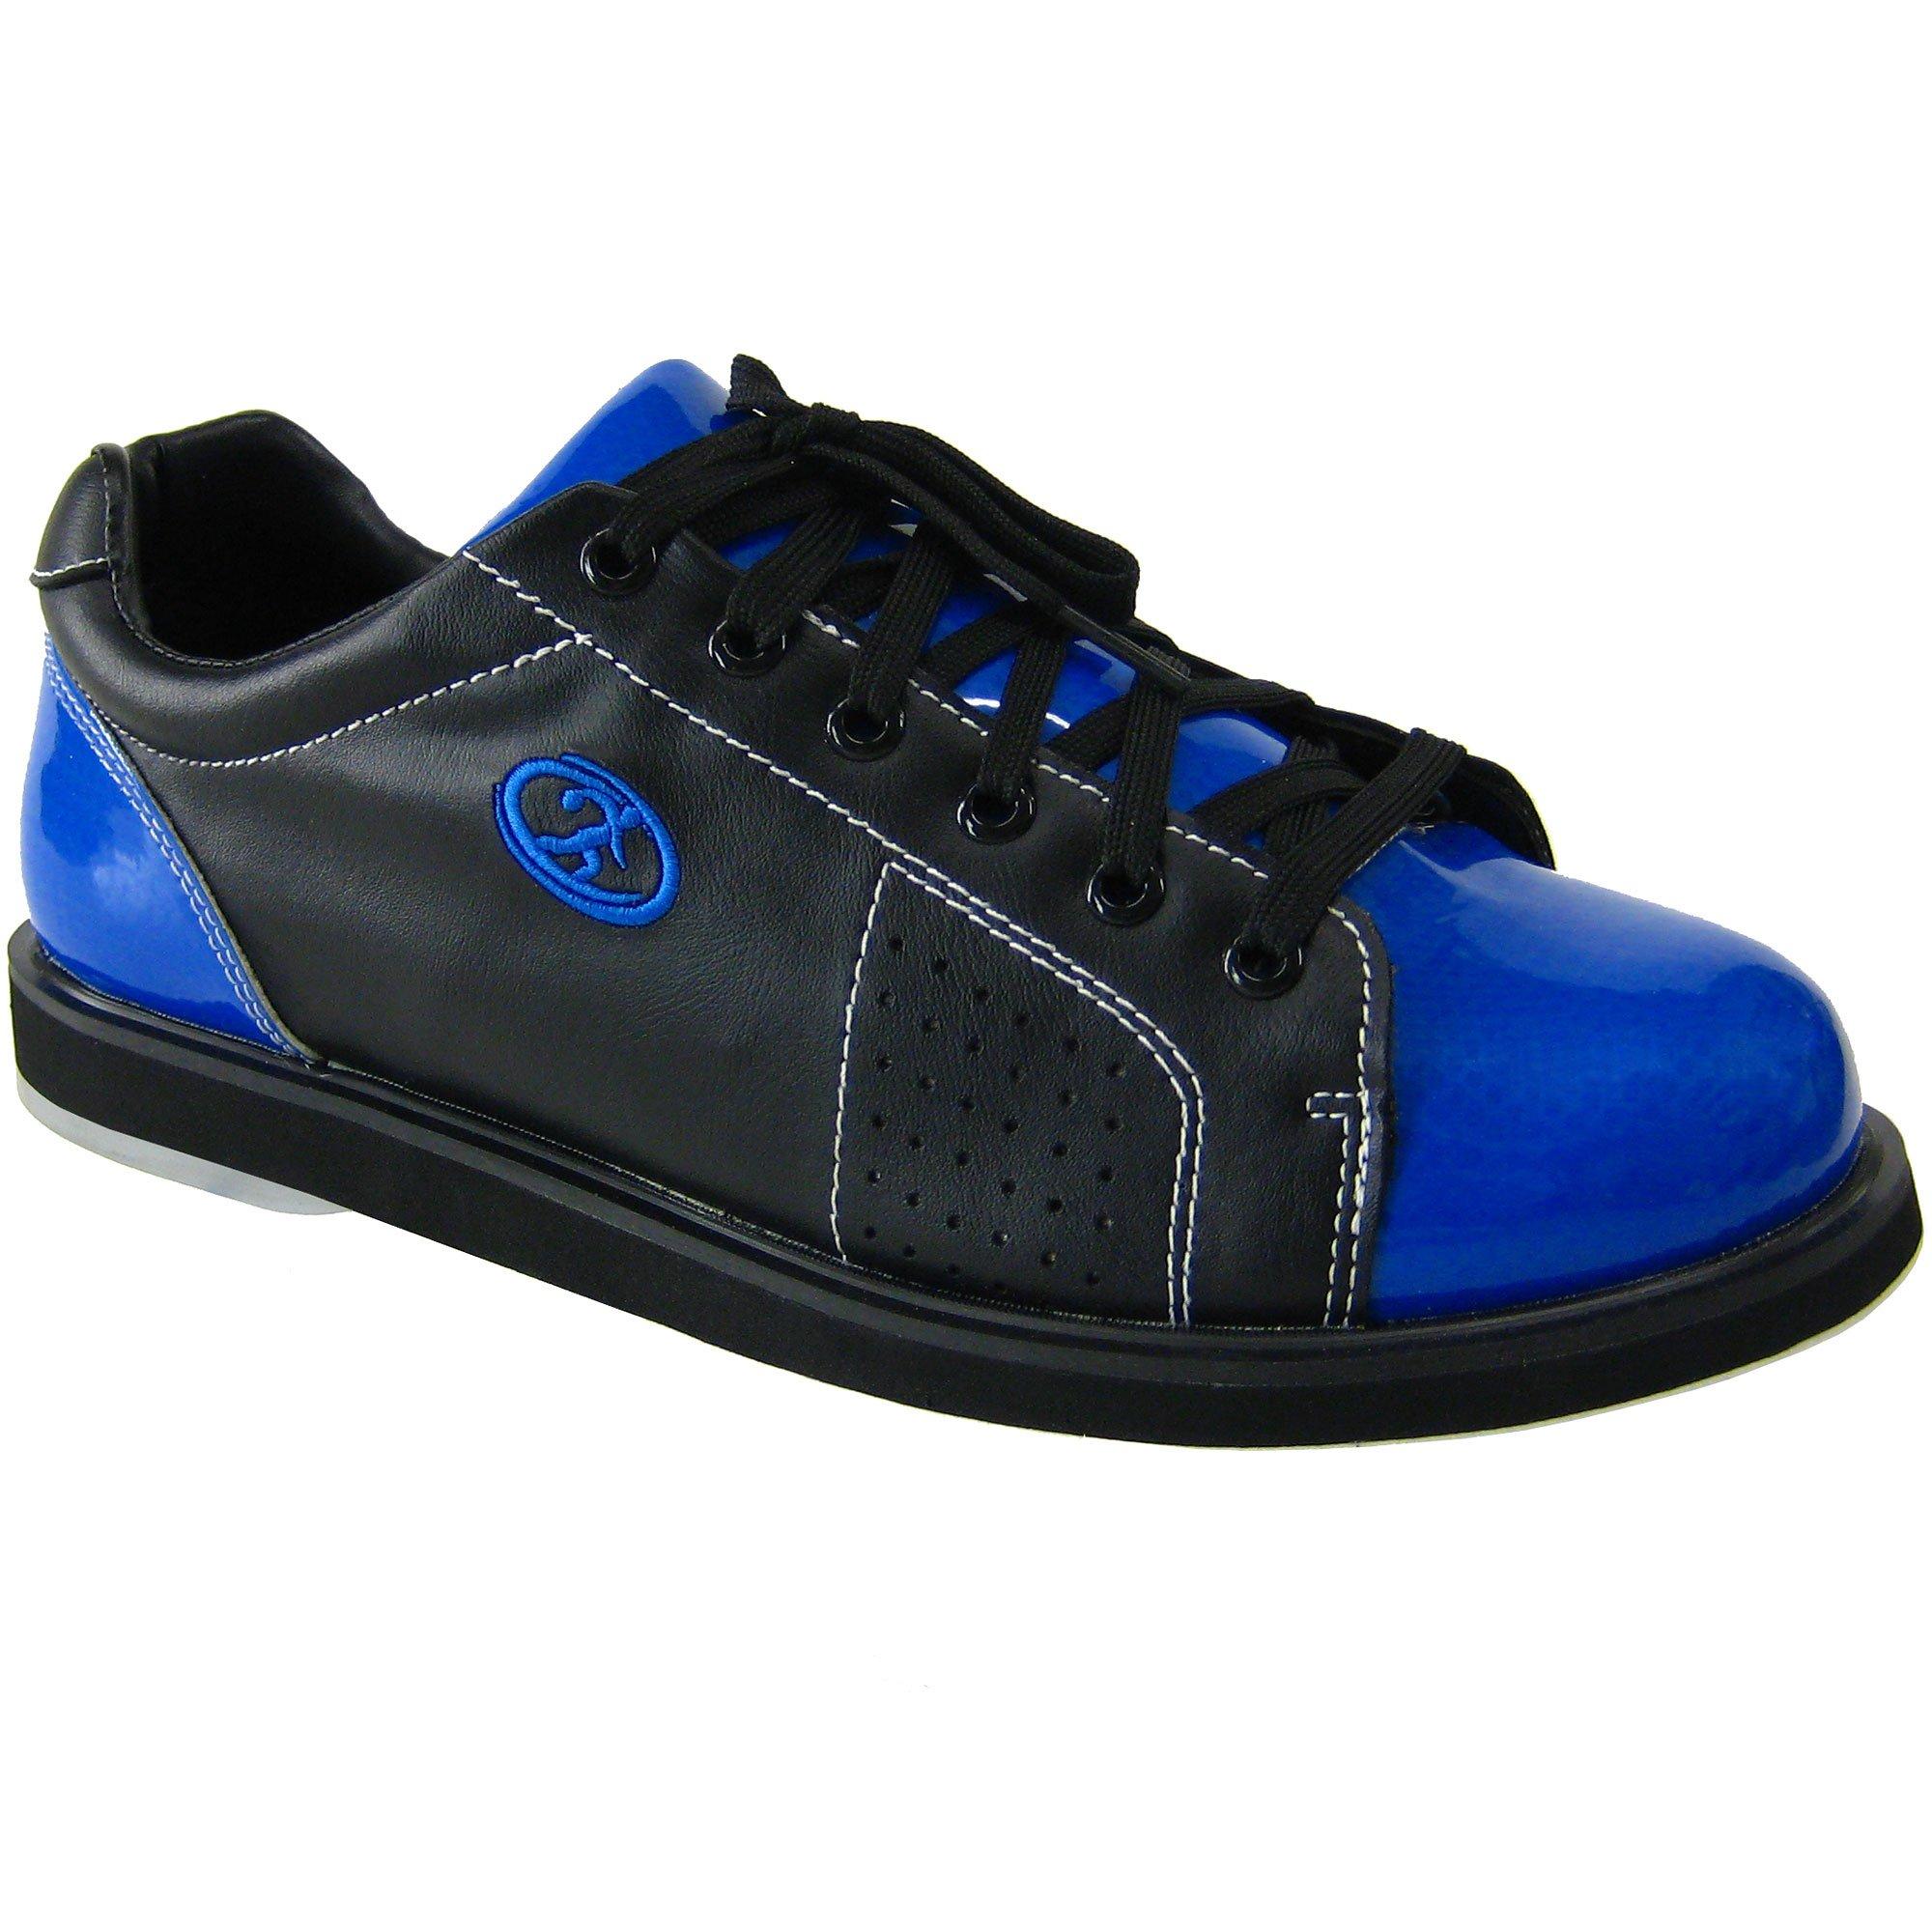 Elite Triton Blue Bowling Shoes - Mens 9.5